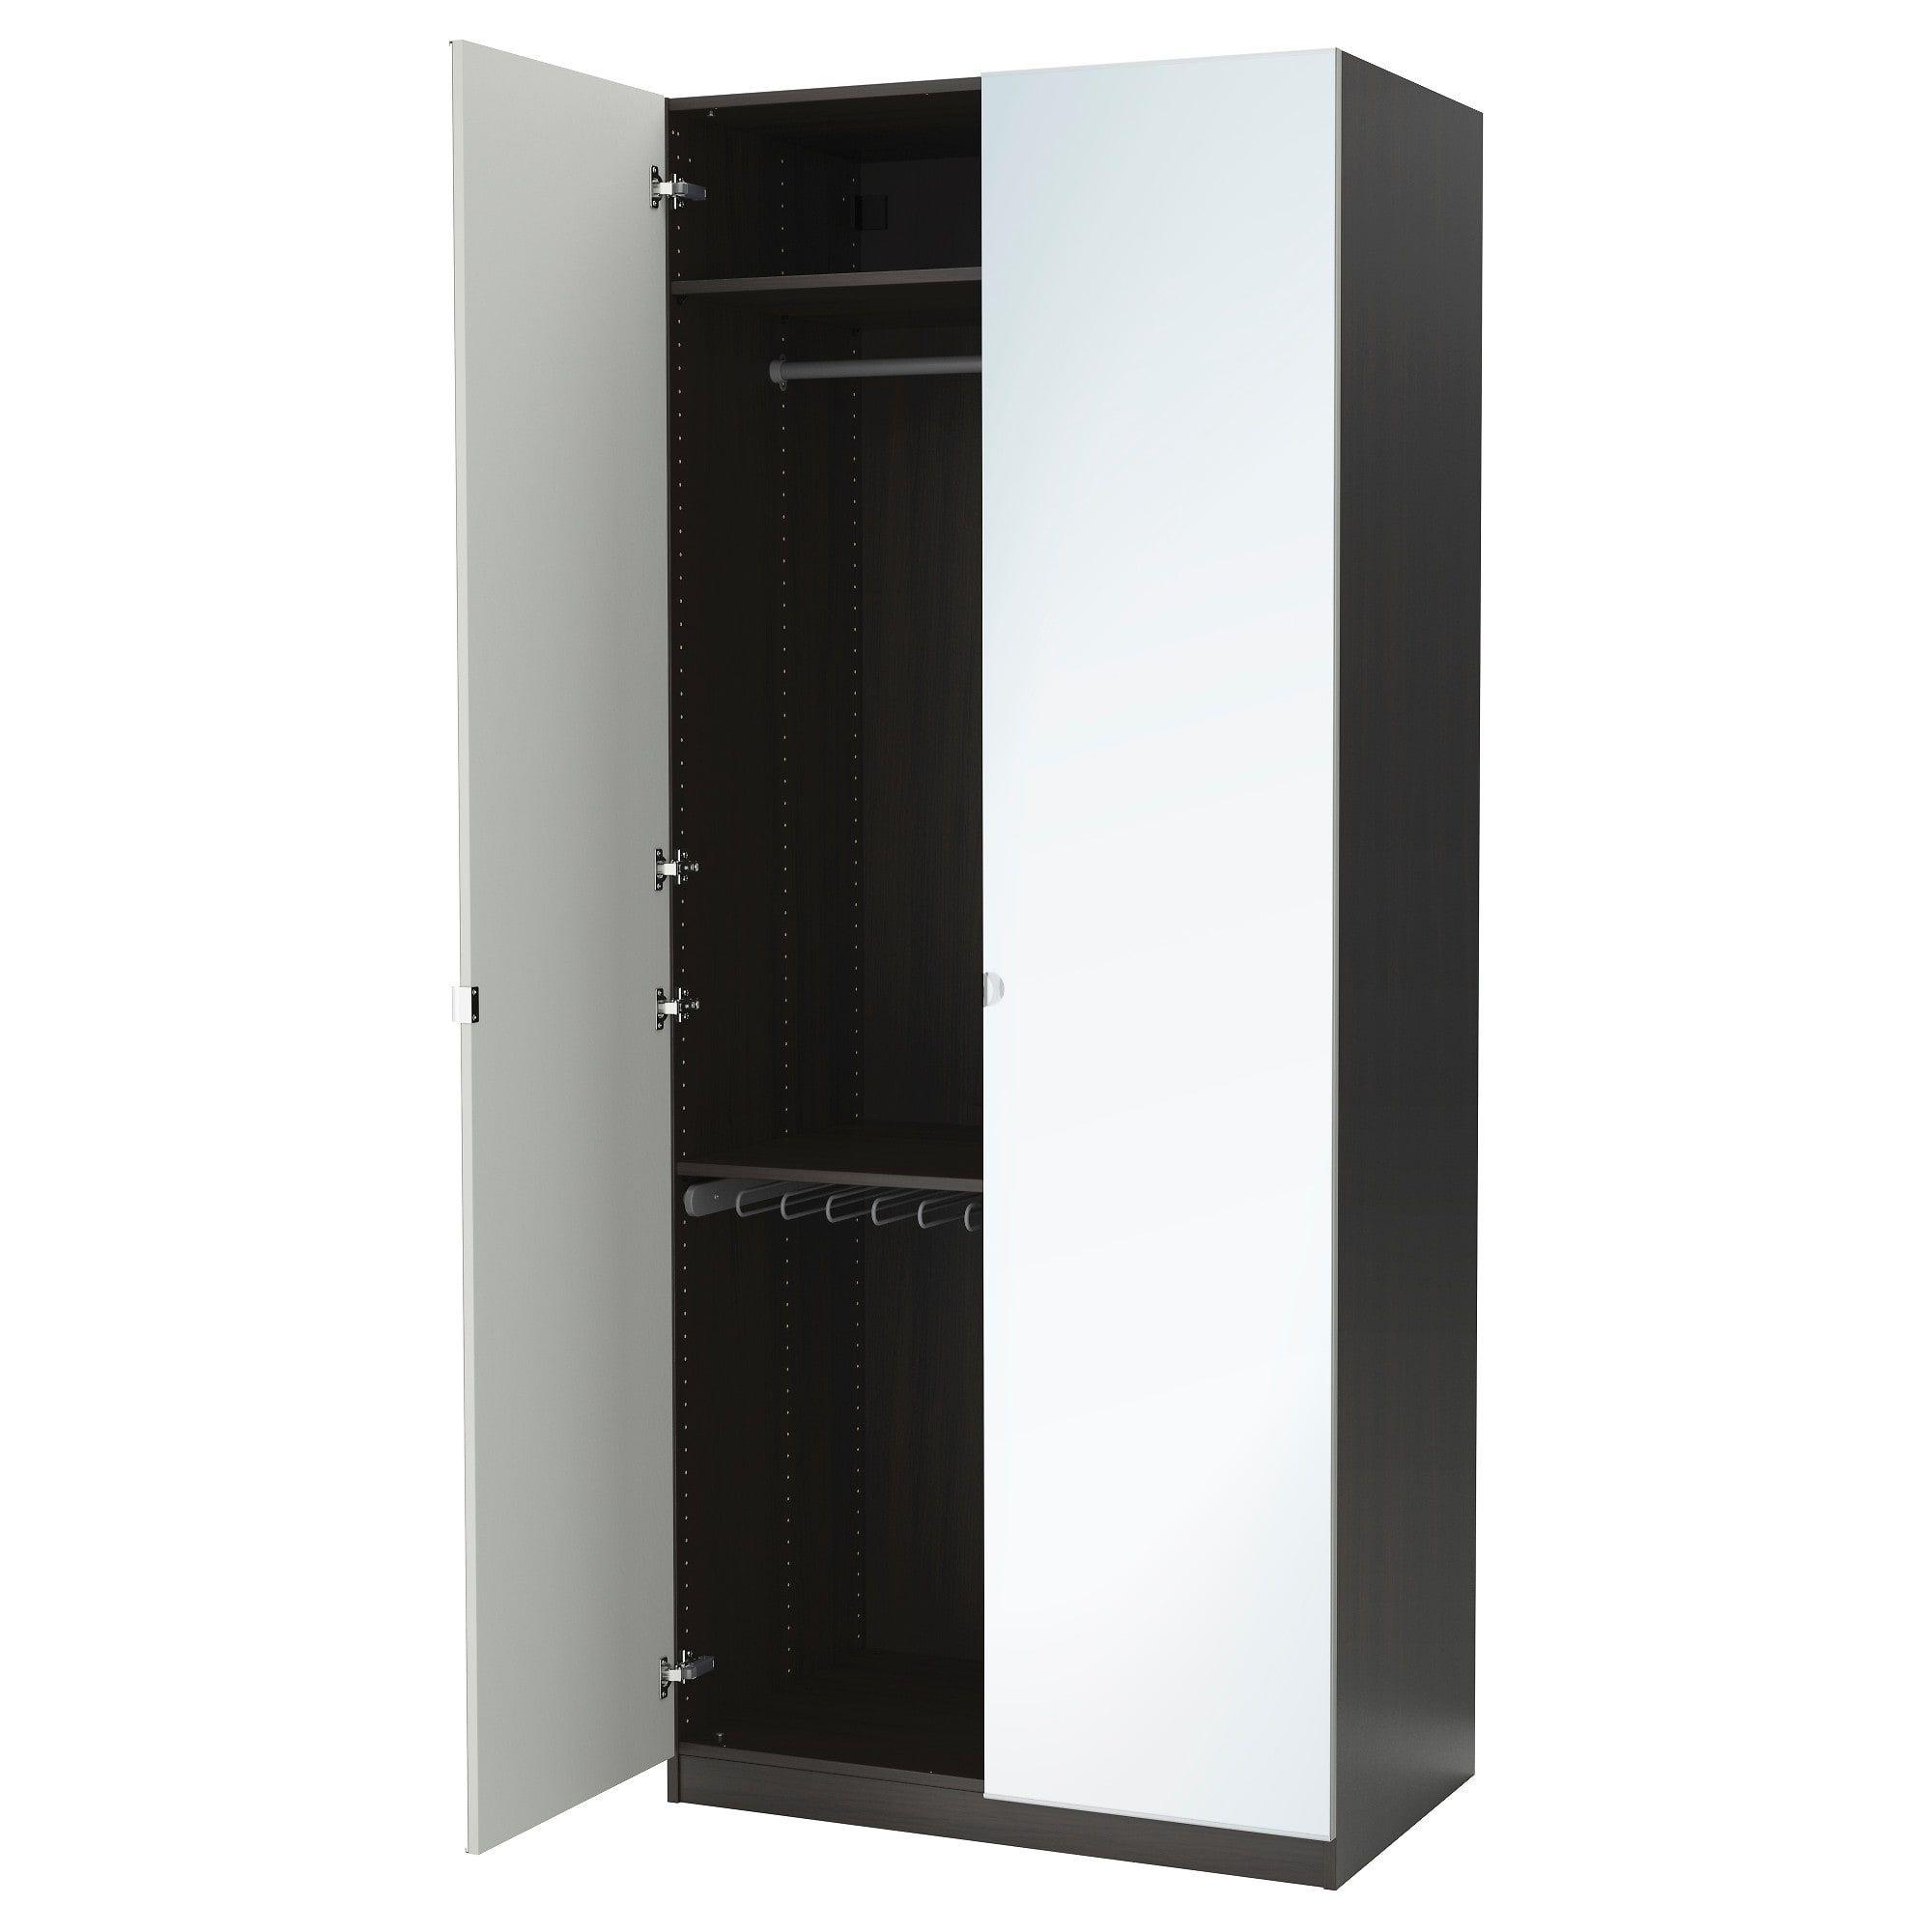 IKEA PAX Wardrobe blackbrown, Vikedal mirror glass